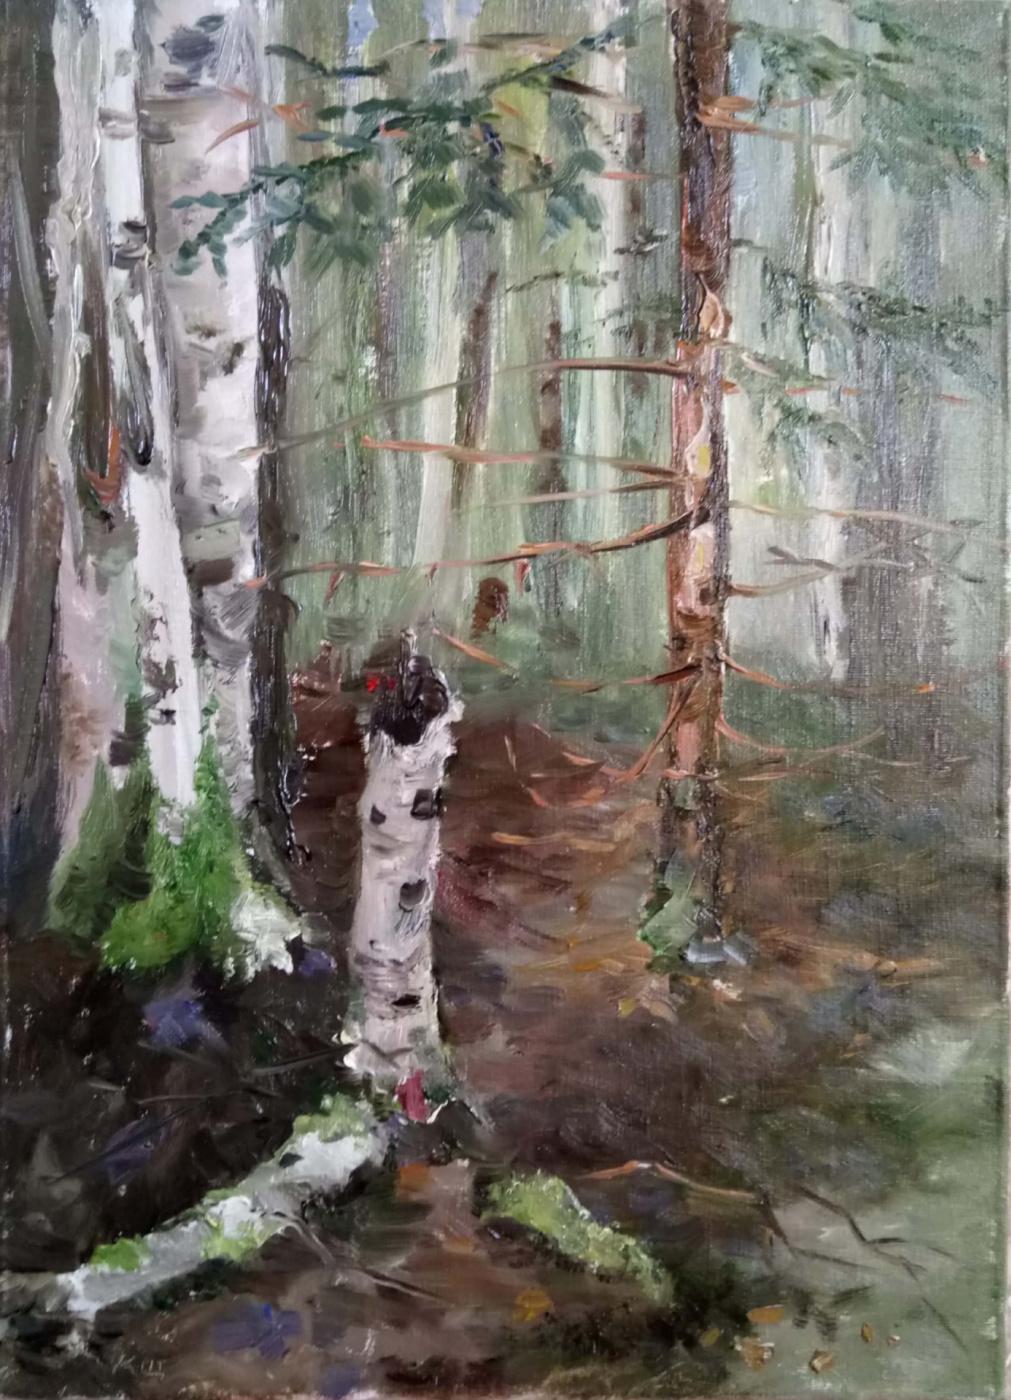 Кристина Щекина. Forest. Etude